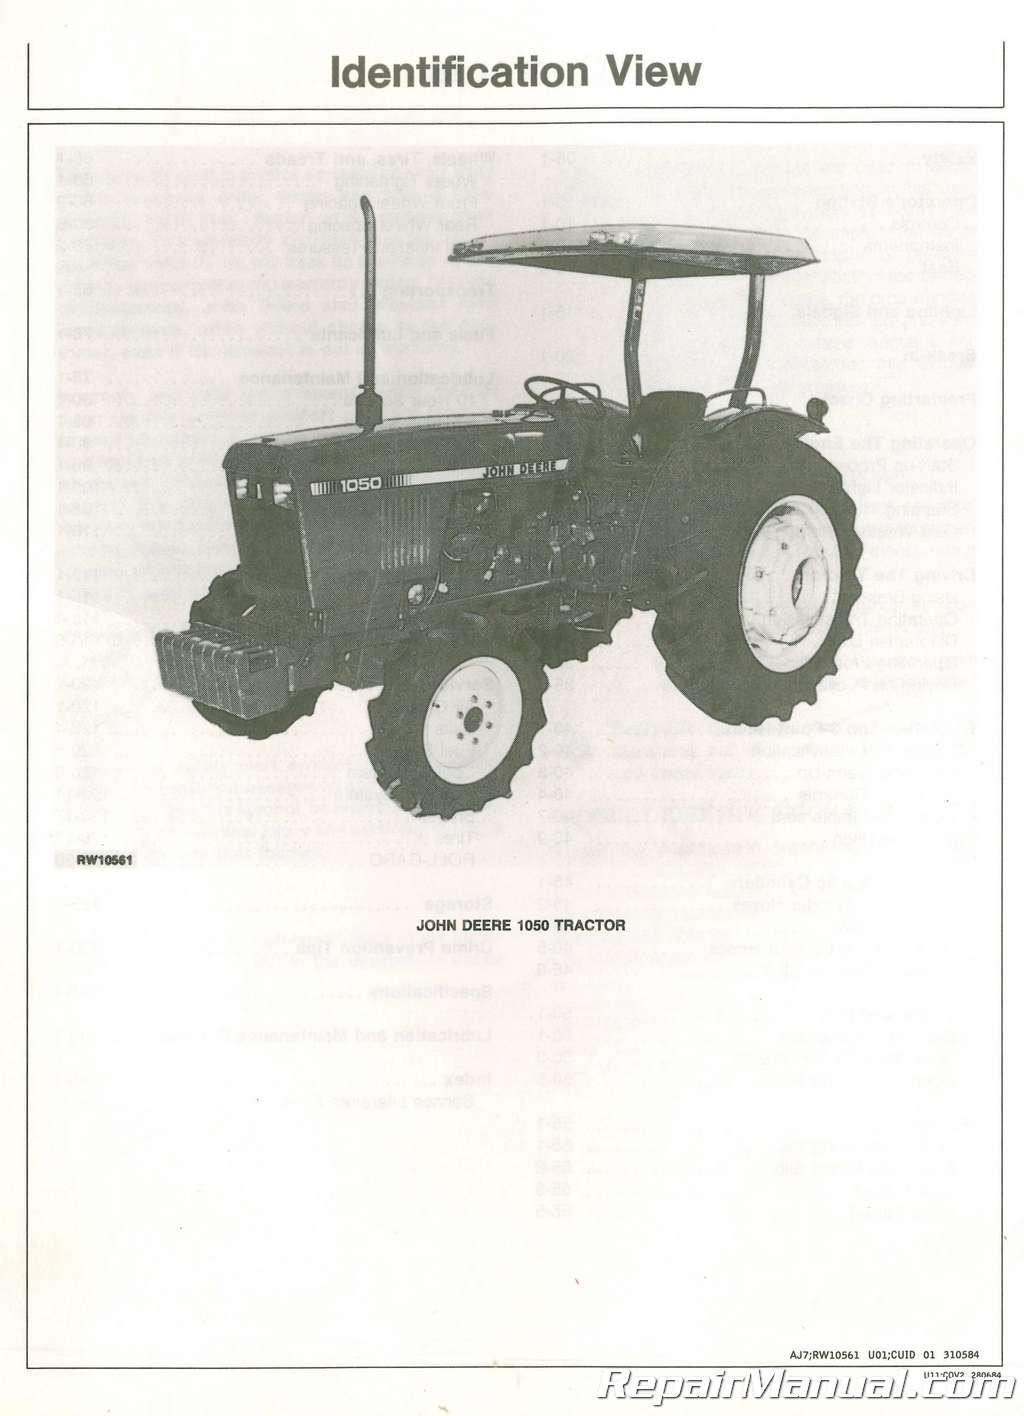 john deere 850 950 1050 tractor operators manual rh repairmanual com john deere 1050 manual online john deere 1050 tractor manual